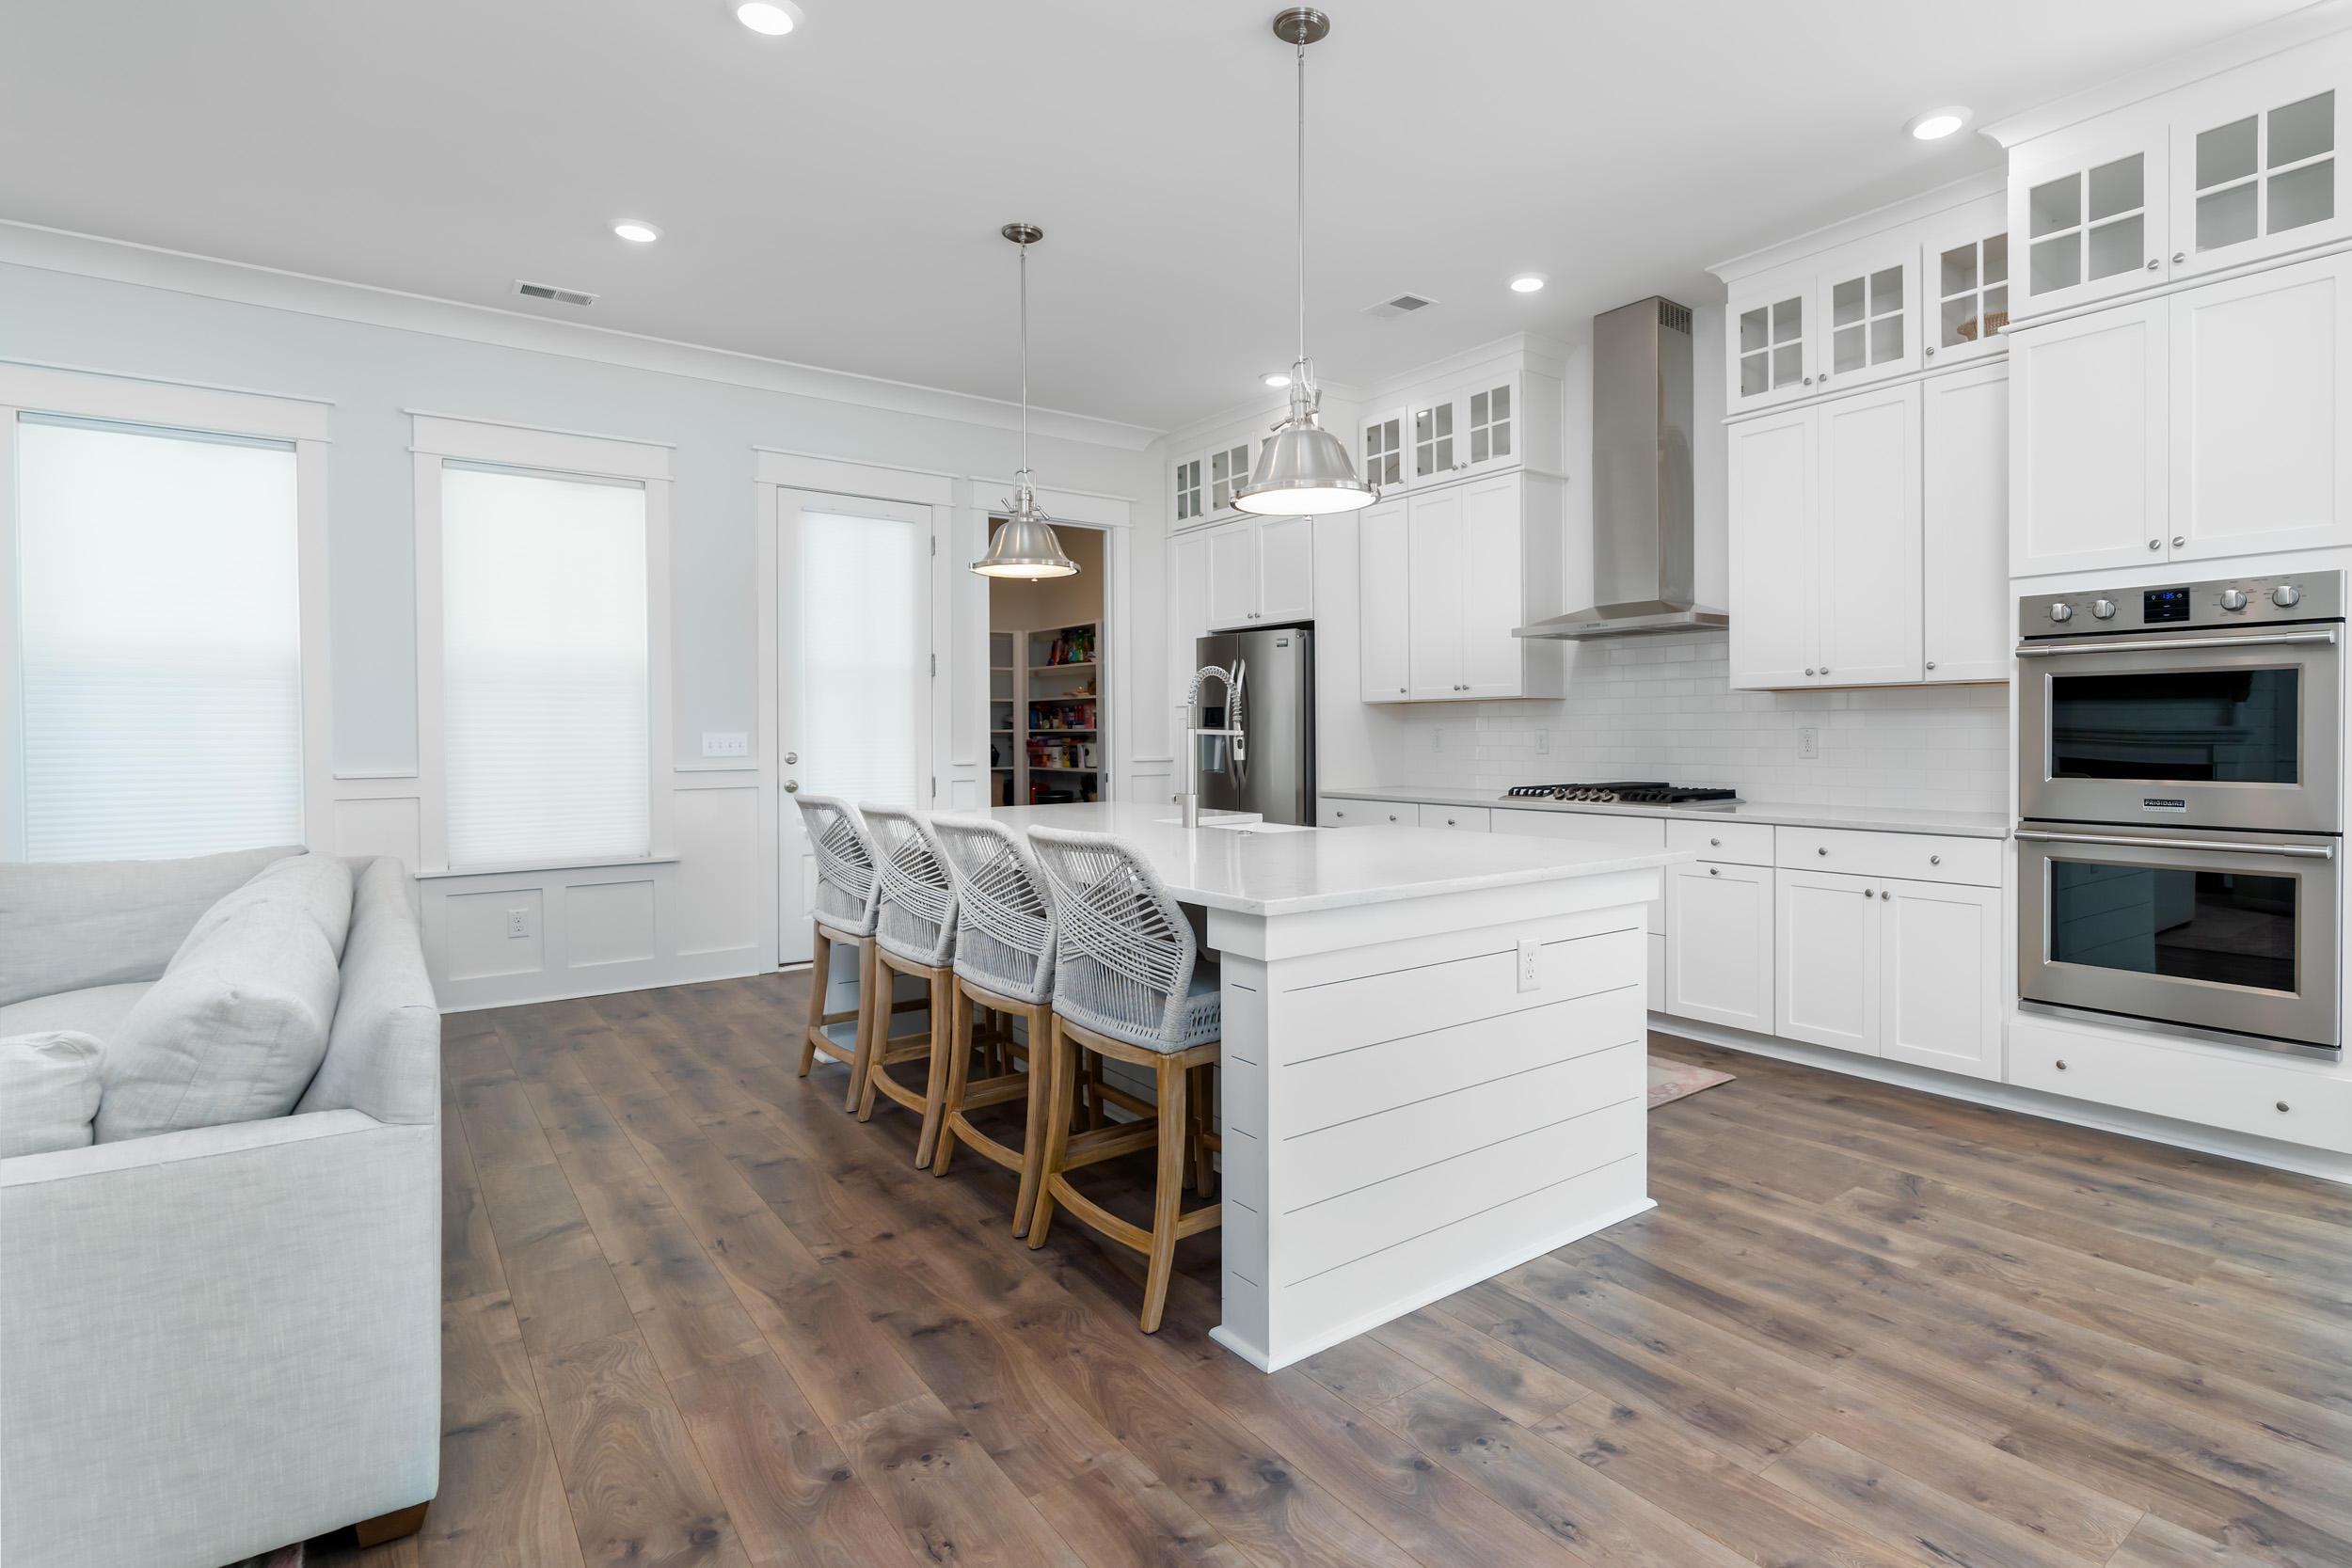 Hamlin Oaks Homes For Sale - 2921 Tranquility, Mount Pleasant, SC - 7